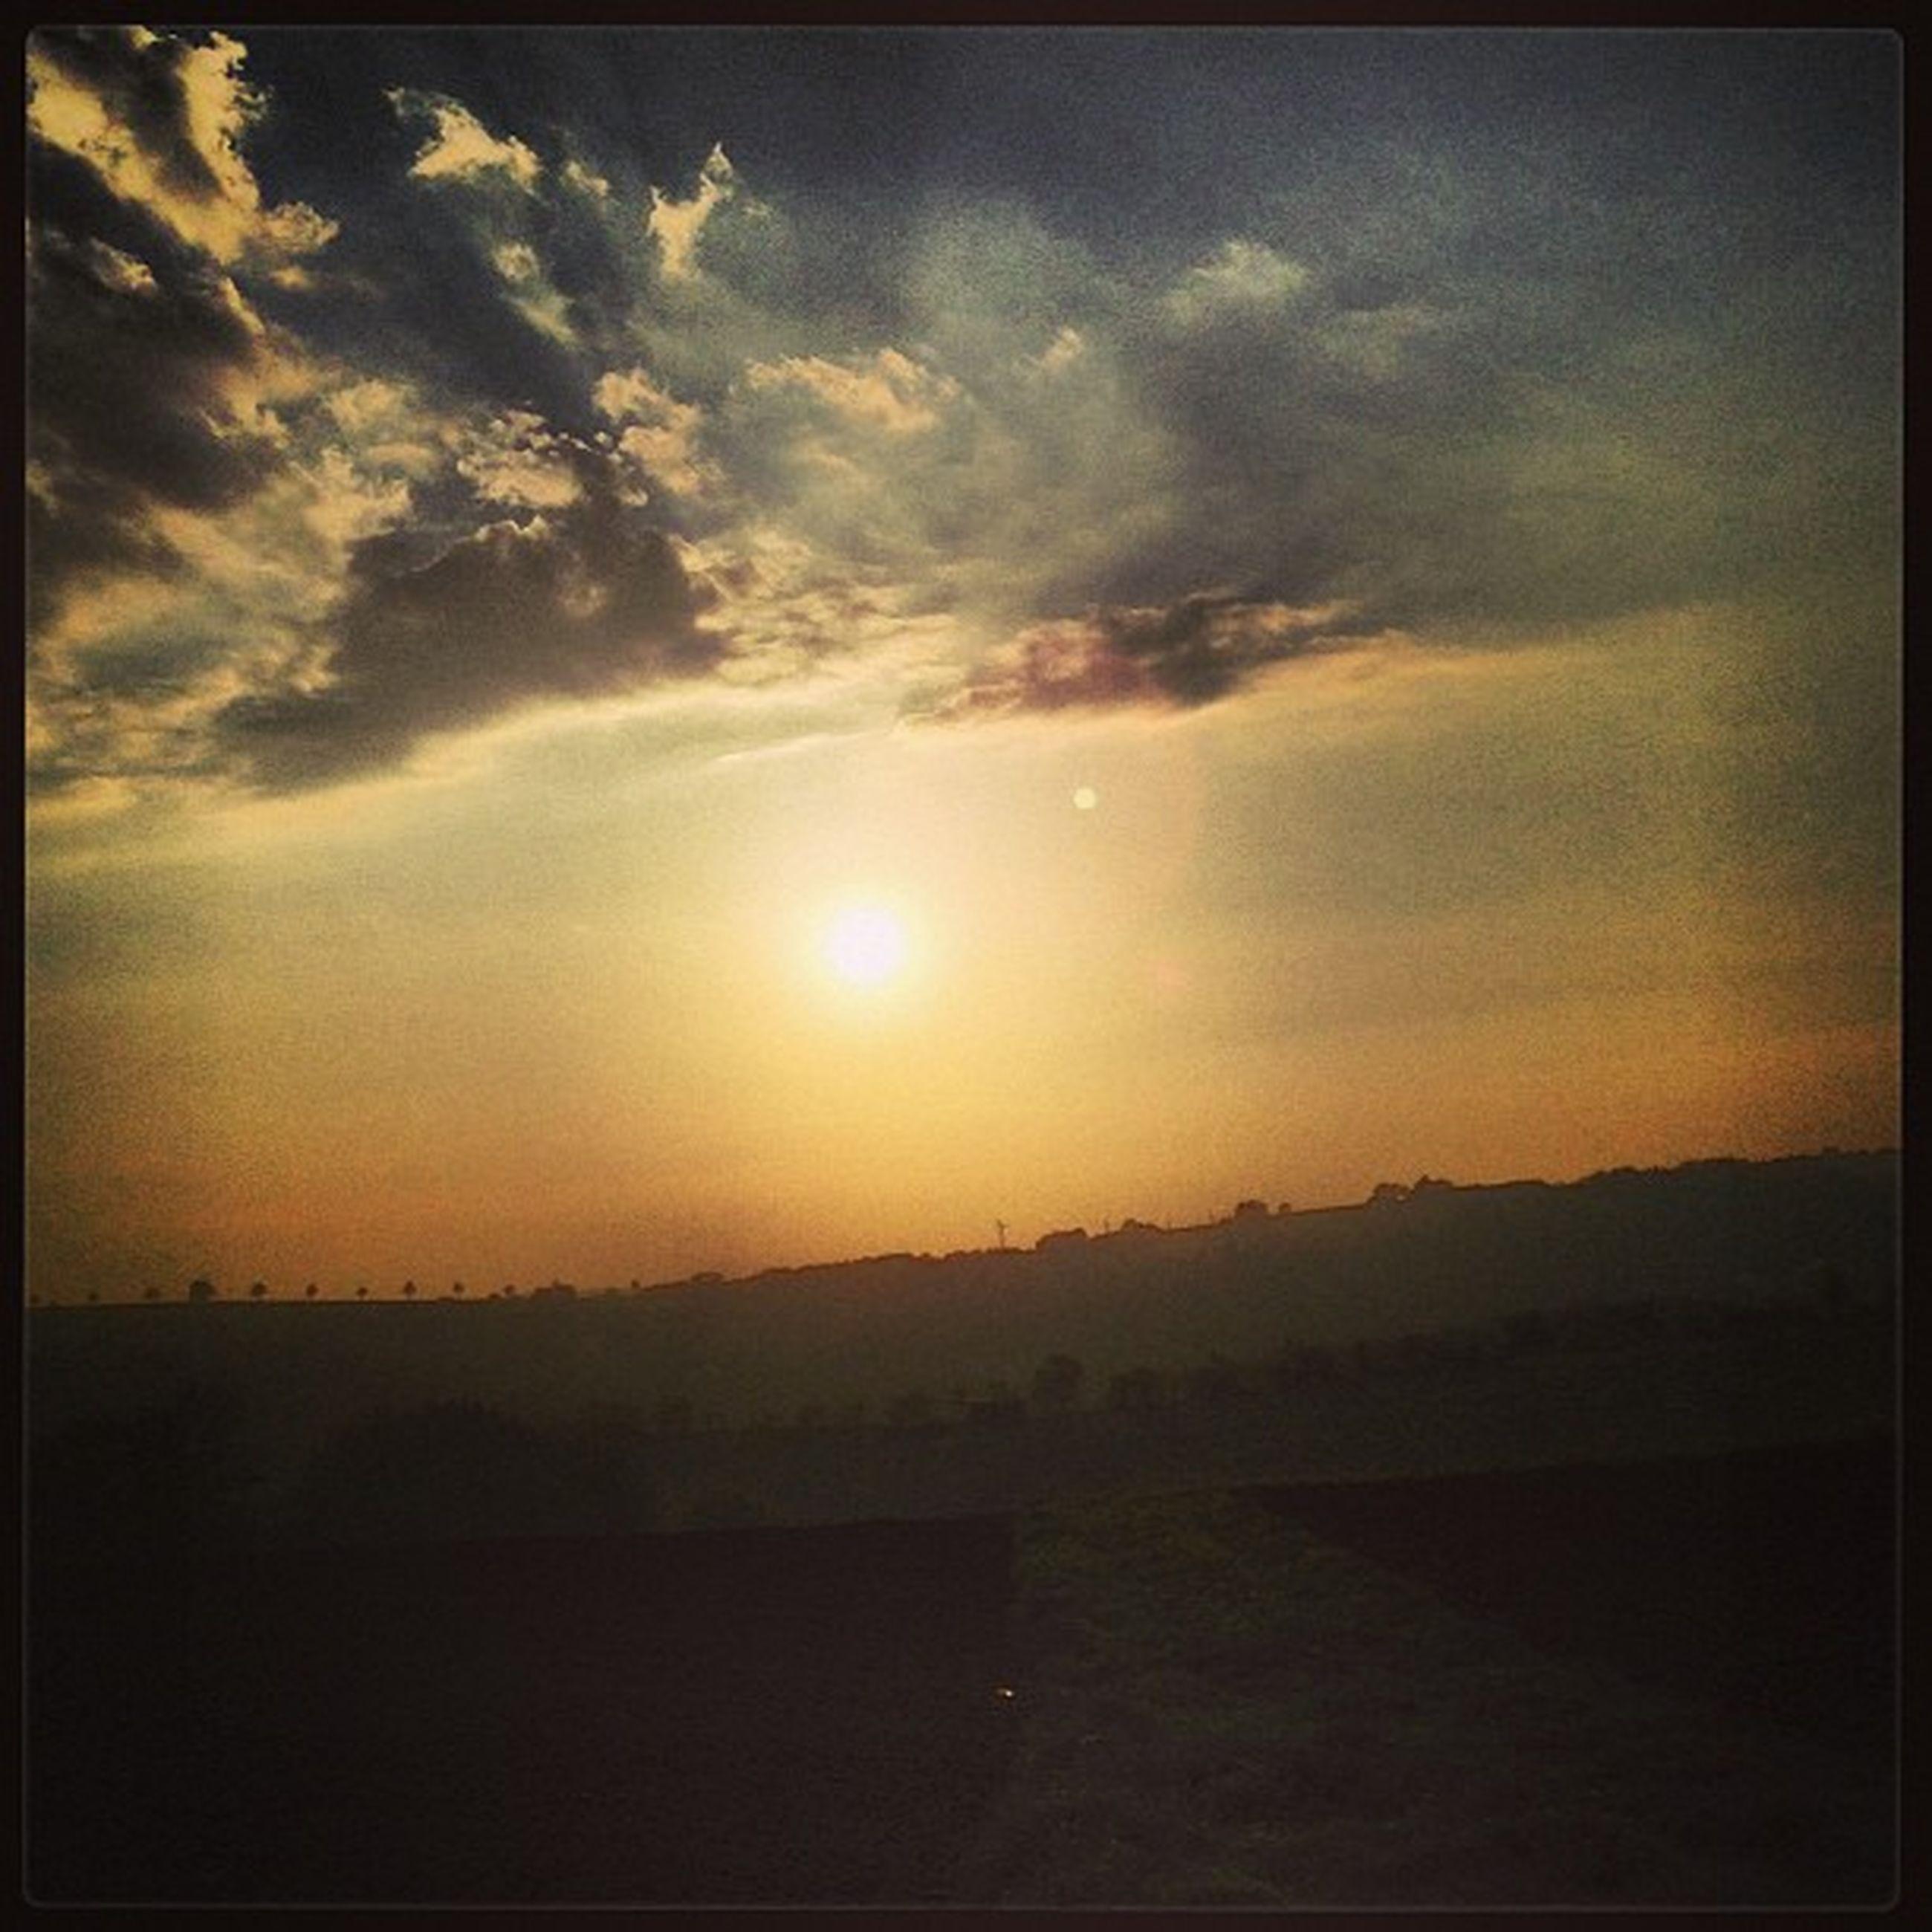 sunset, sun, tranquil scene, scenics, tranquility, sky, beauty in nature, transfer print, landscape, sunlight, nature, sunbeam, cloud - sky, idyllic, orange color, silhouette, lens flare, auto post production filter, cloud, outdoors